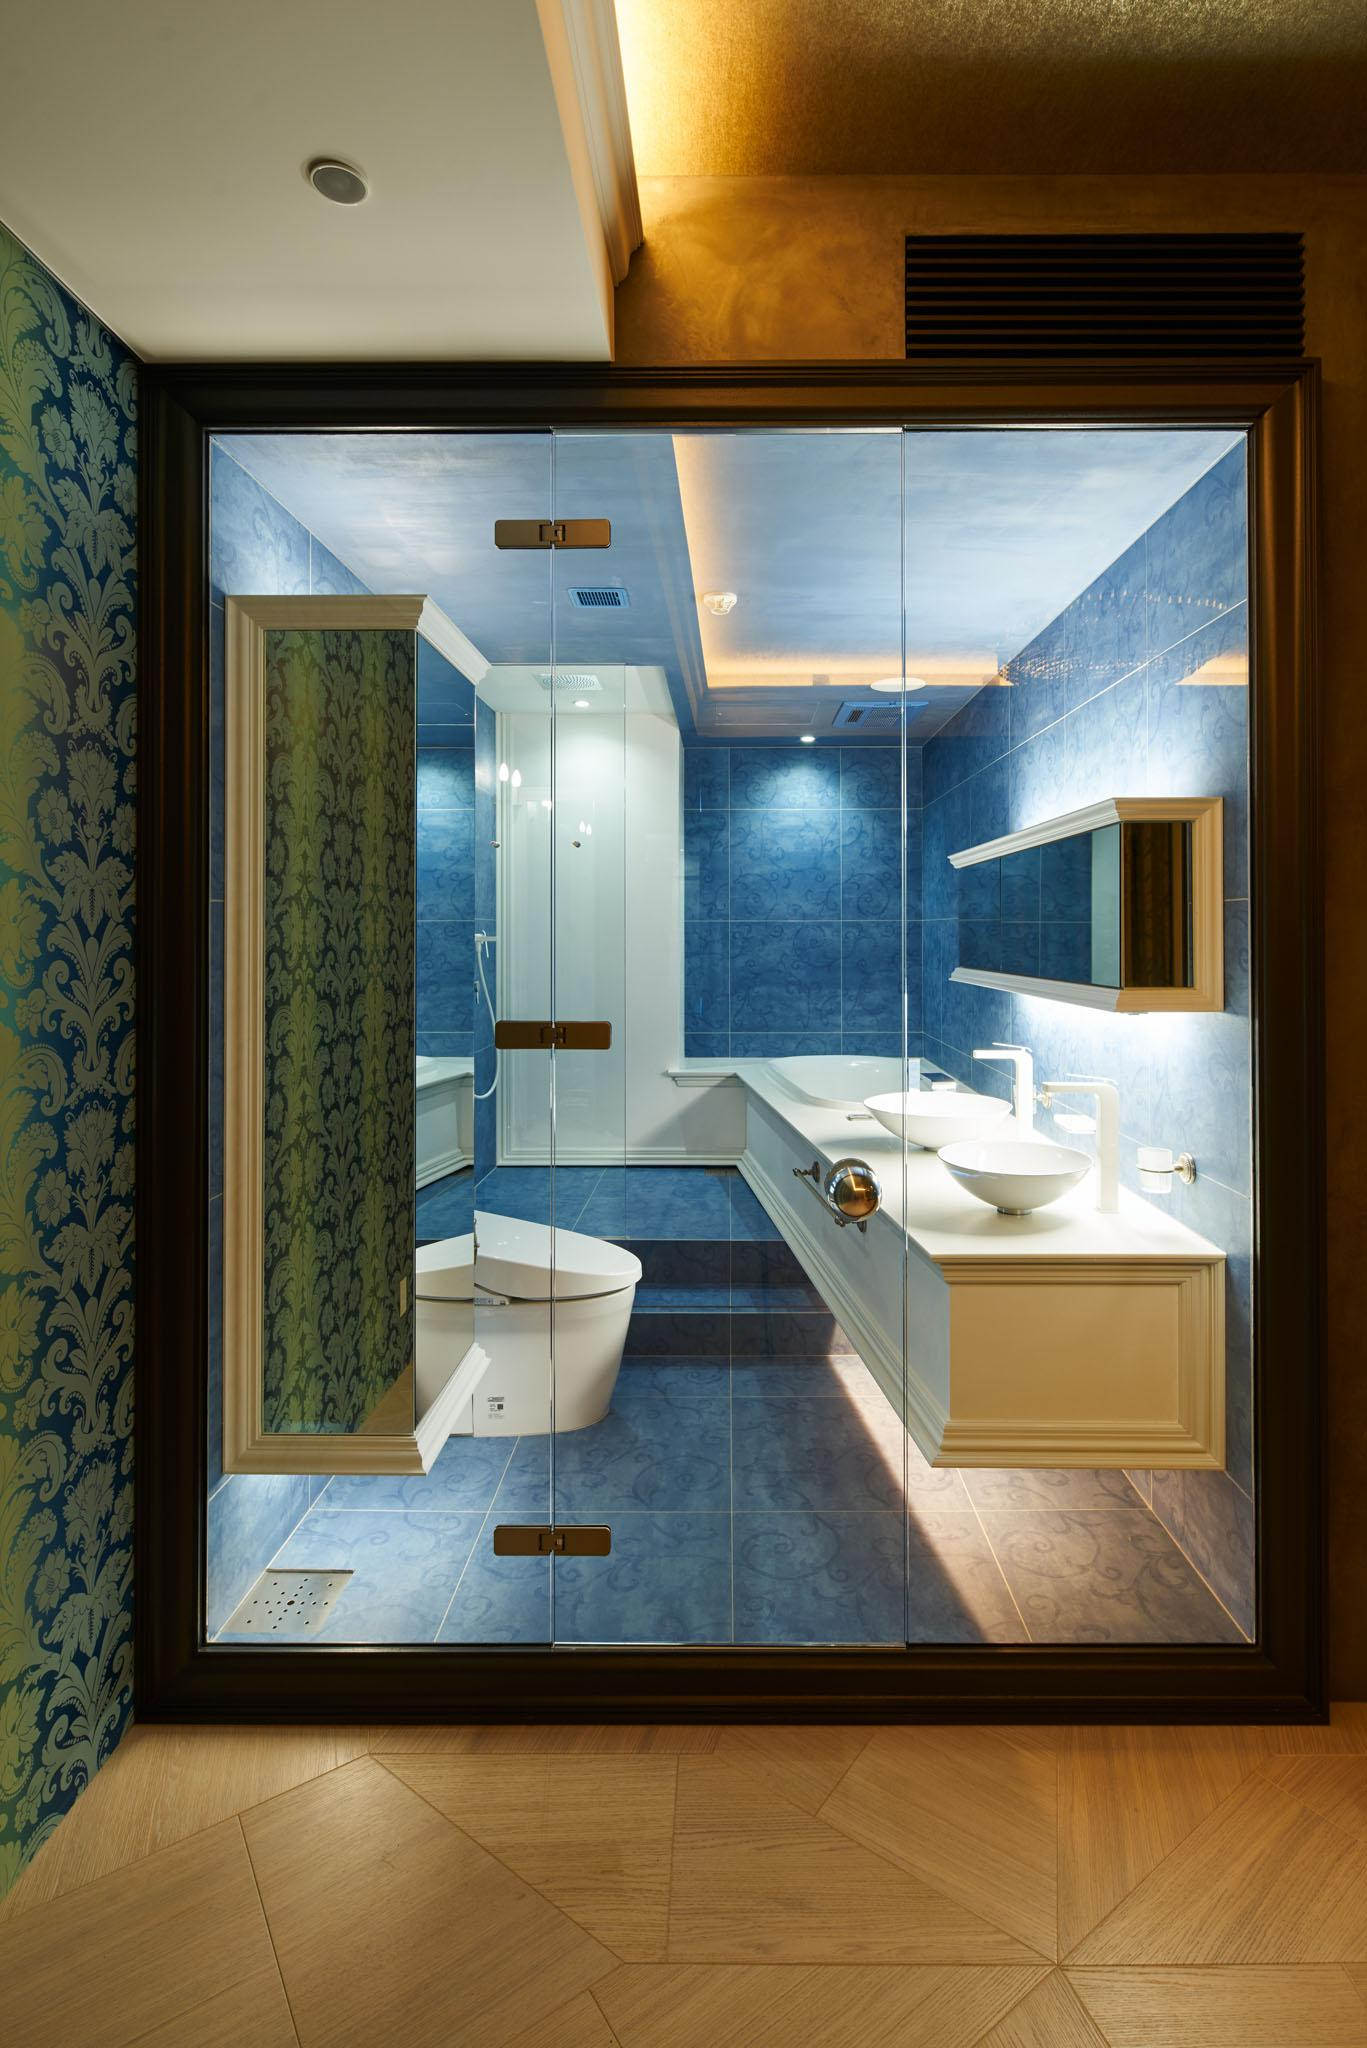 G-HOUSEの写真 ガラス張りのトイレと洗面